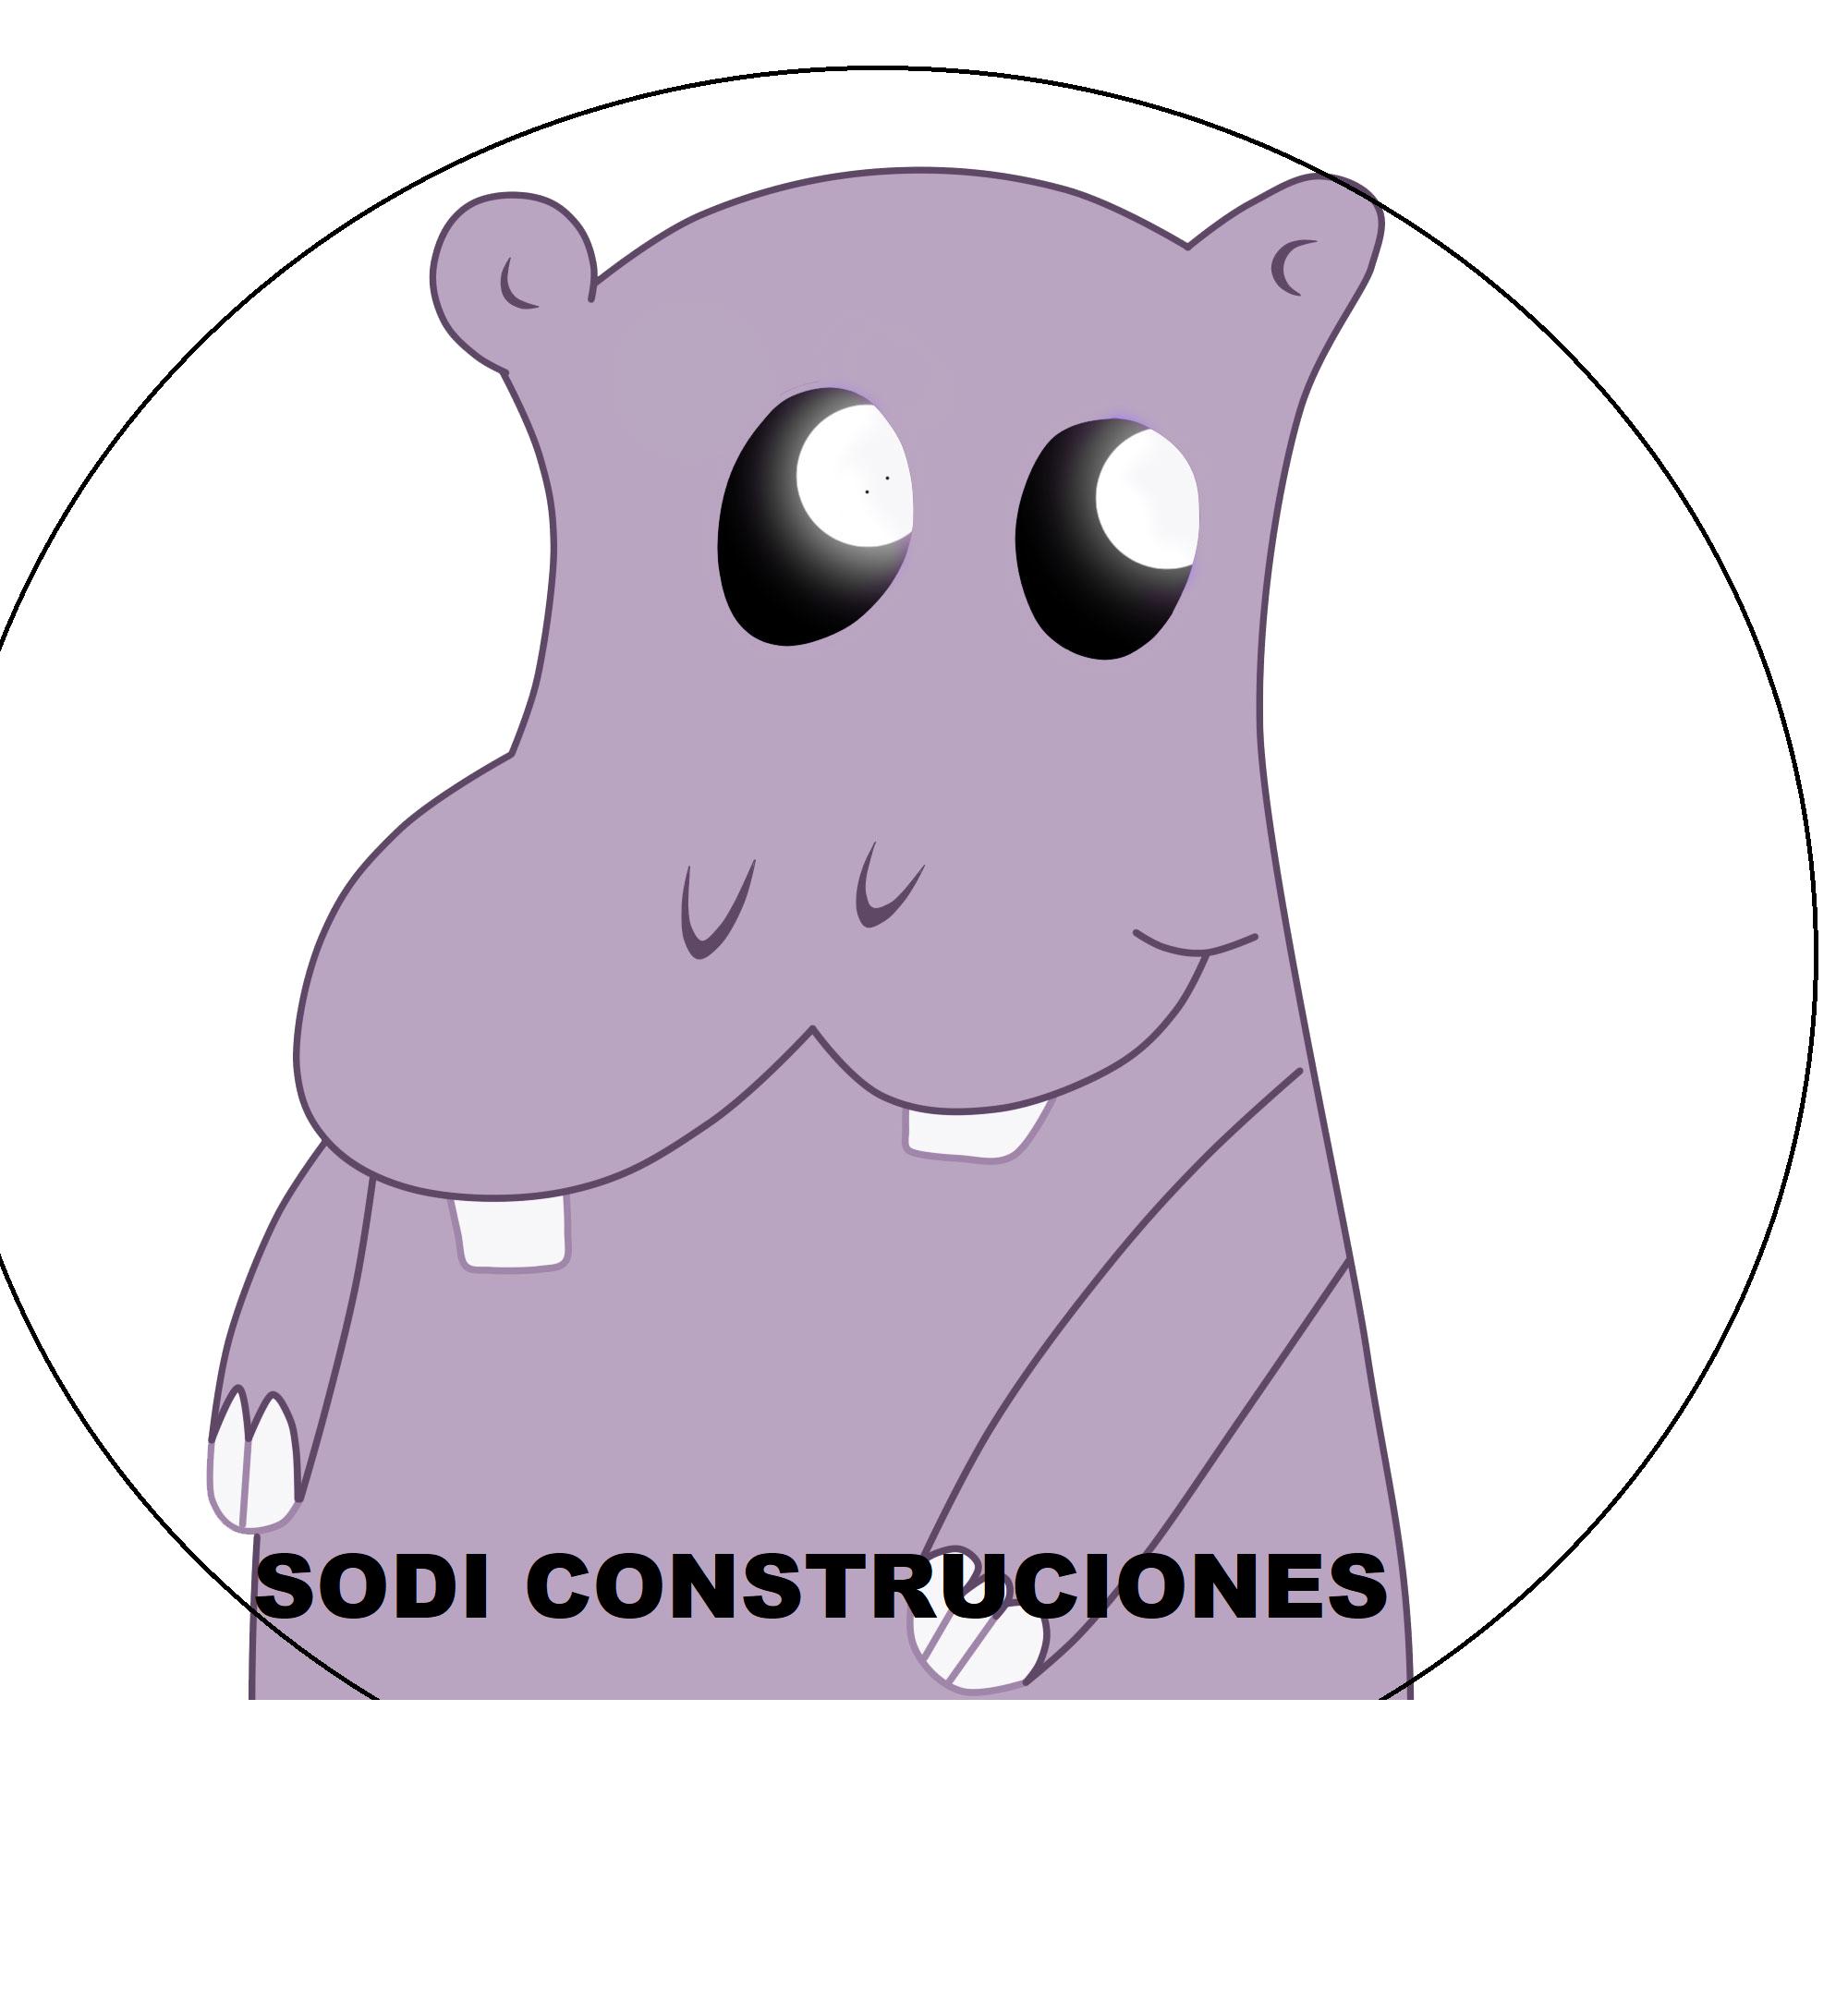 Sodi Construcciones